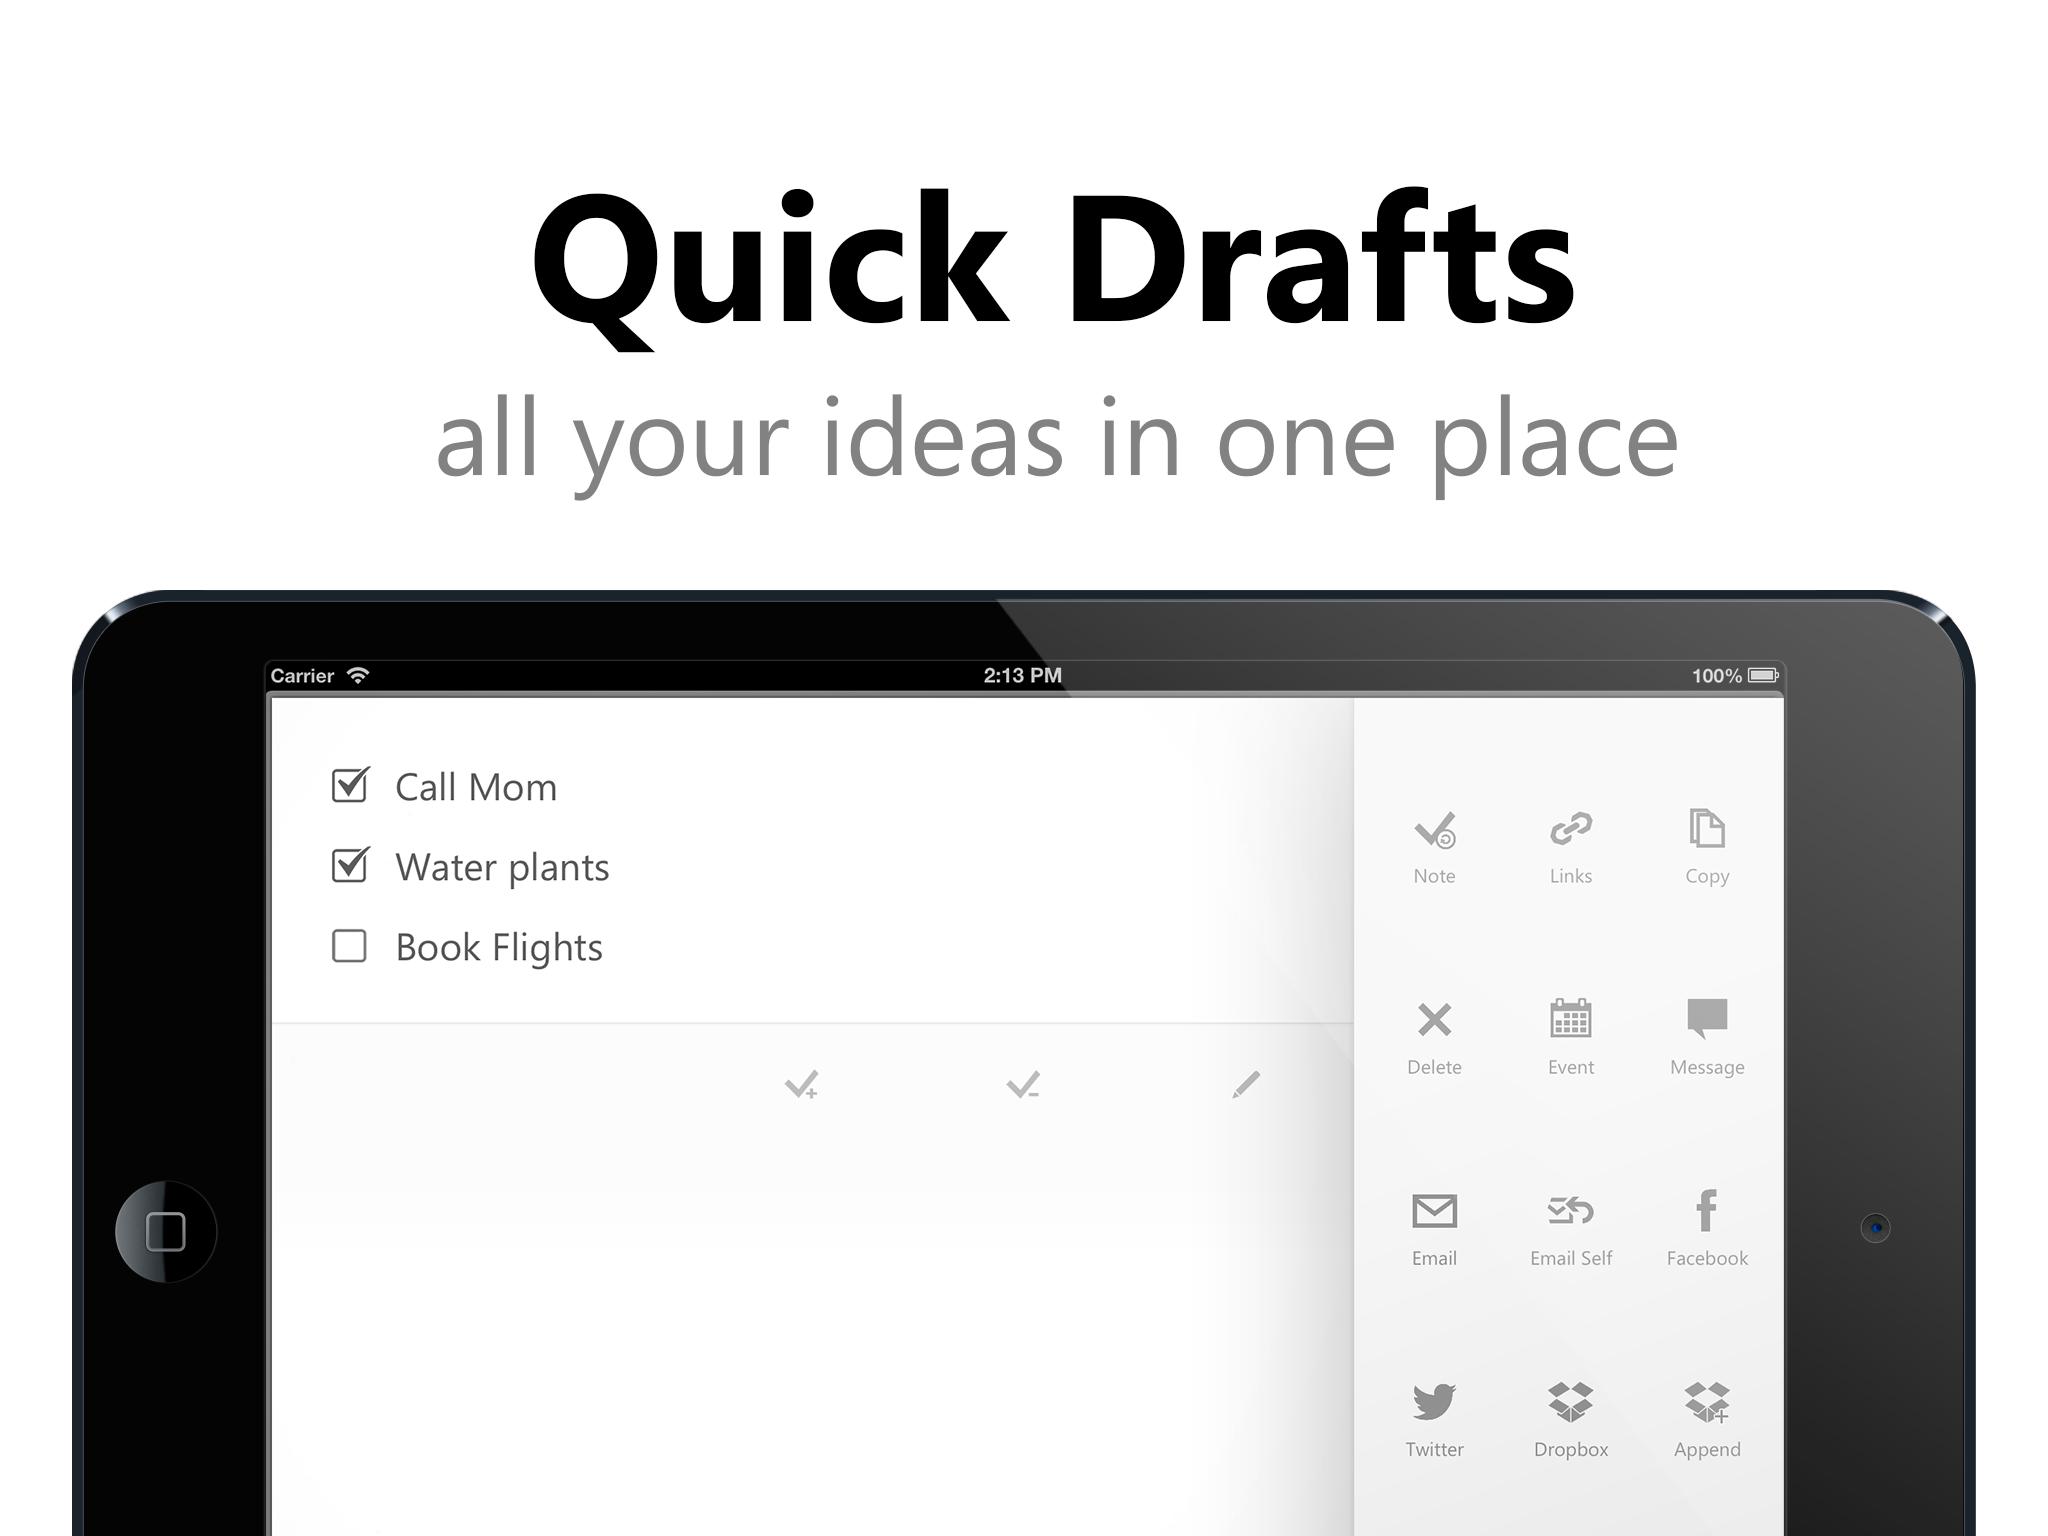 Quick Drafts